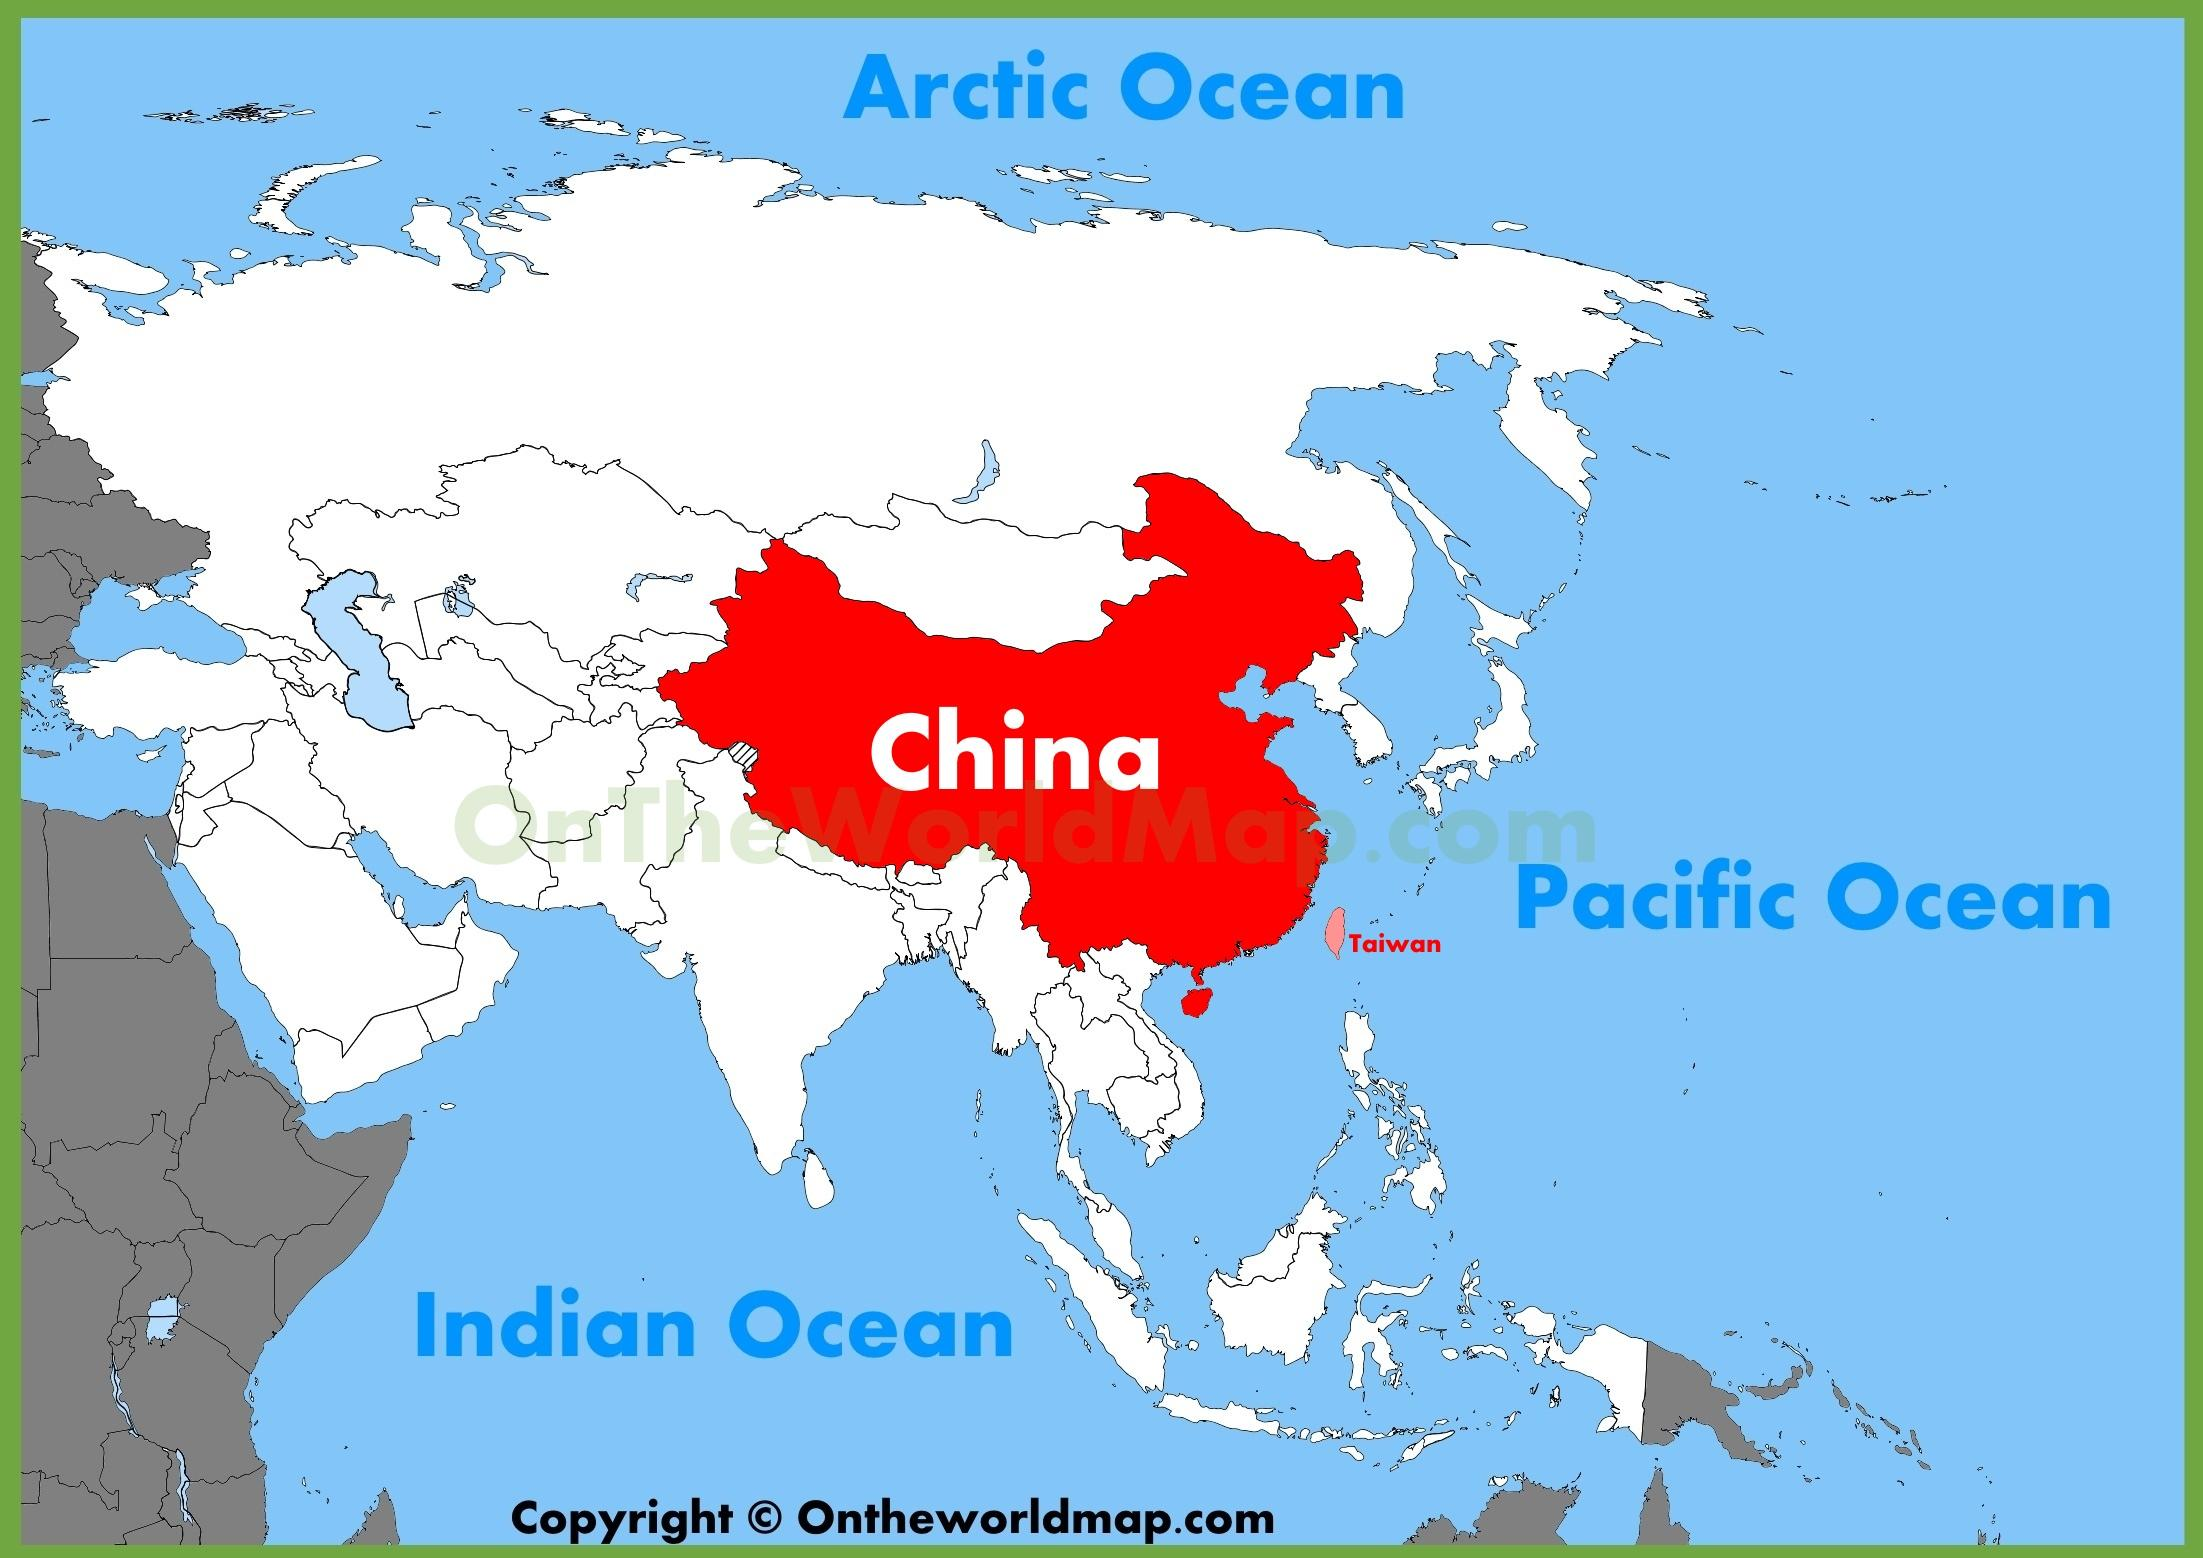 östra asien karta Asien Kina karta   Kina asien karta (Östra asien   Asien) östra asien karta